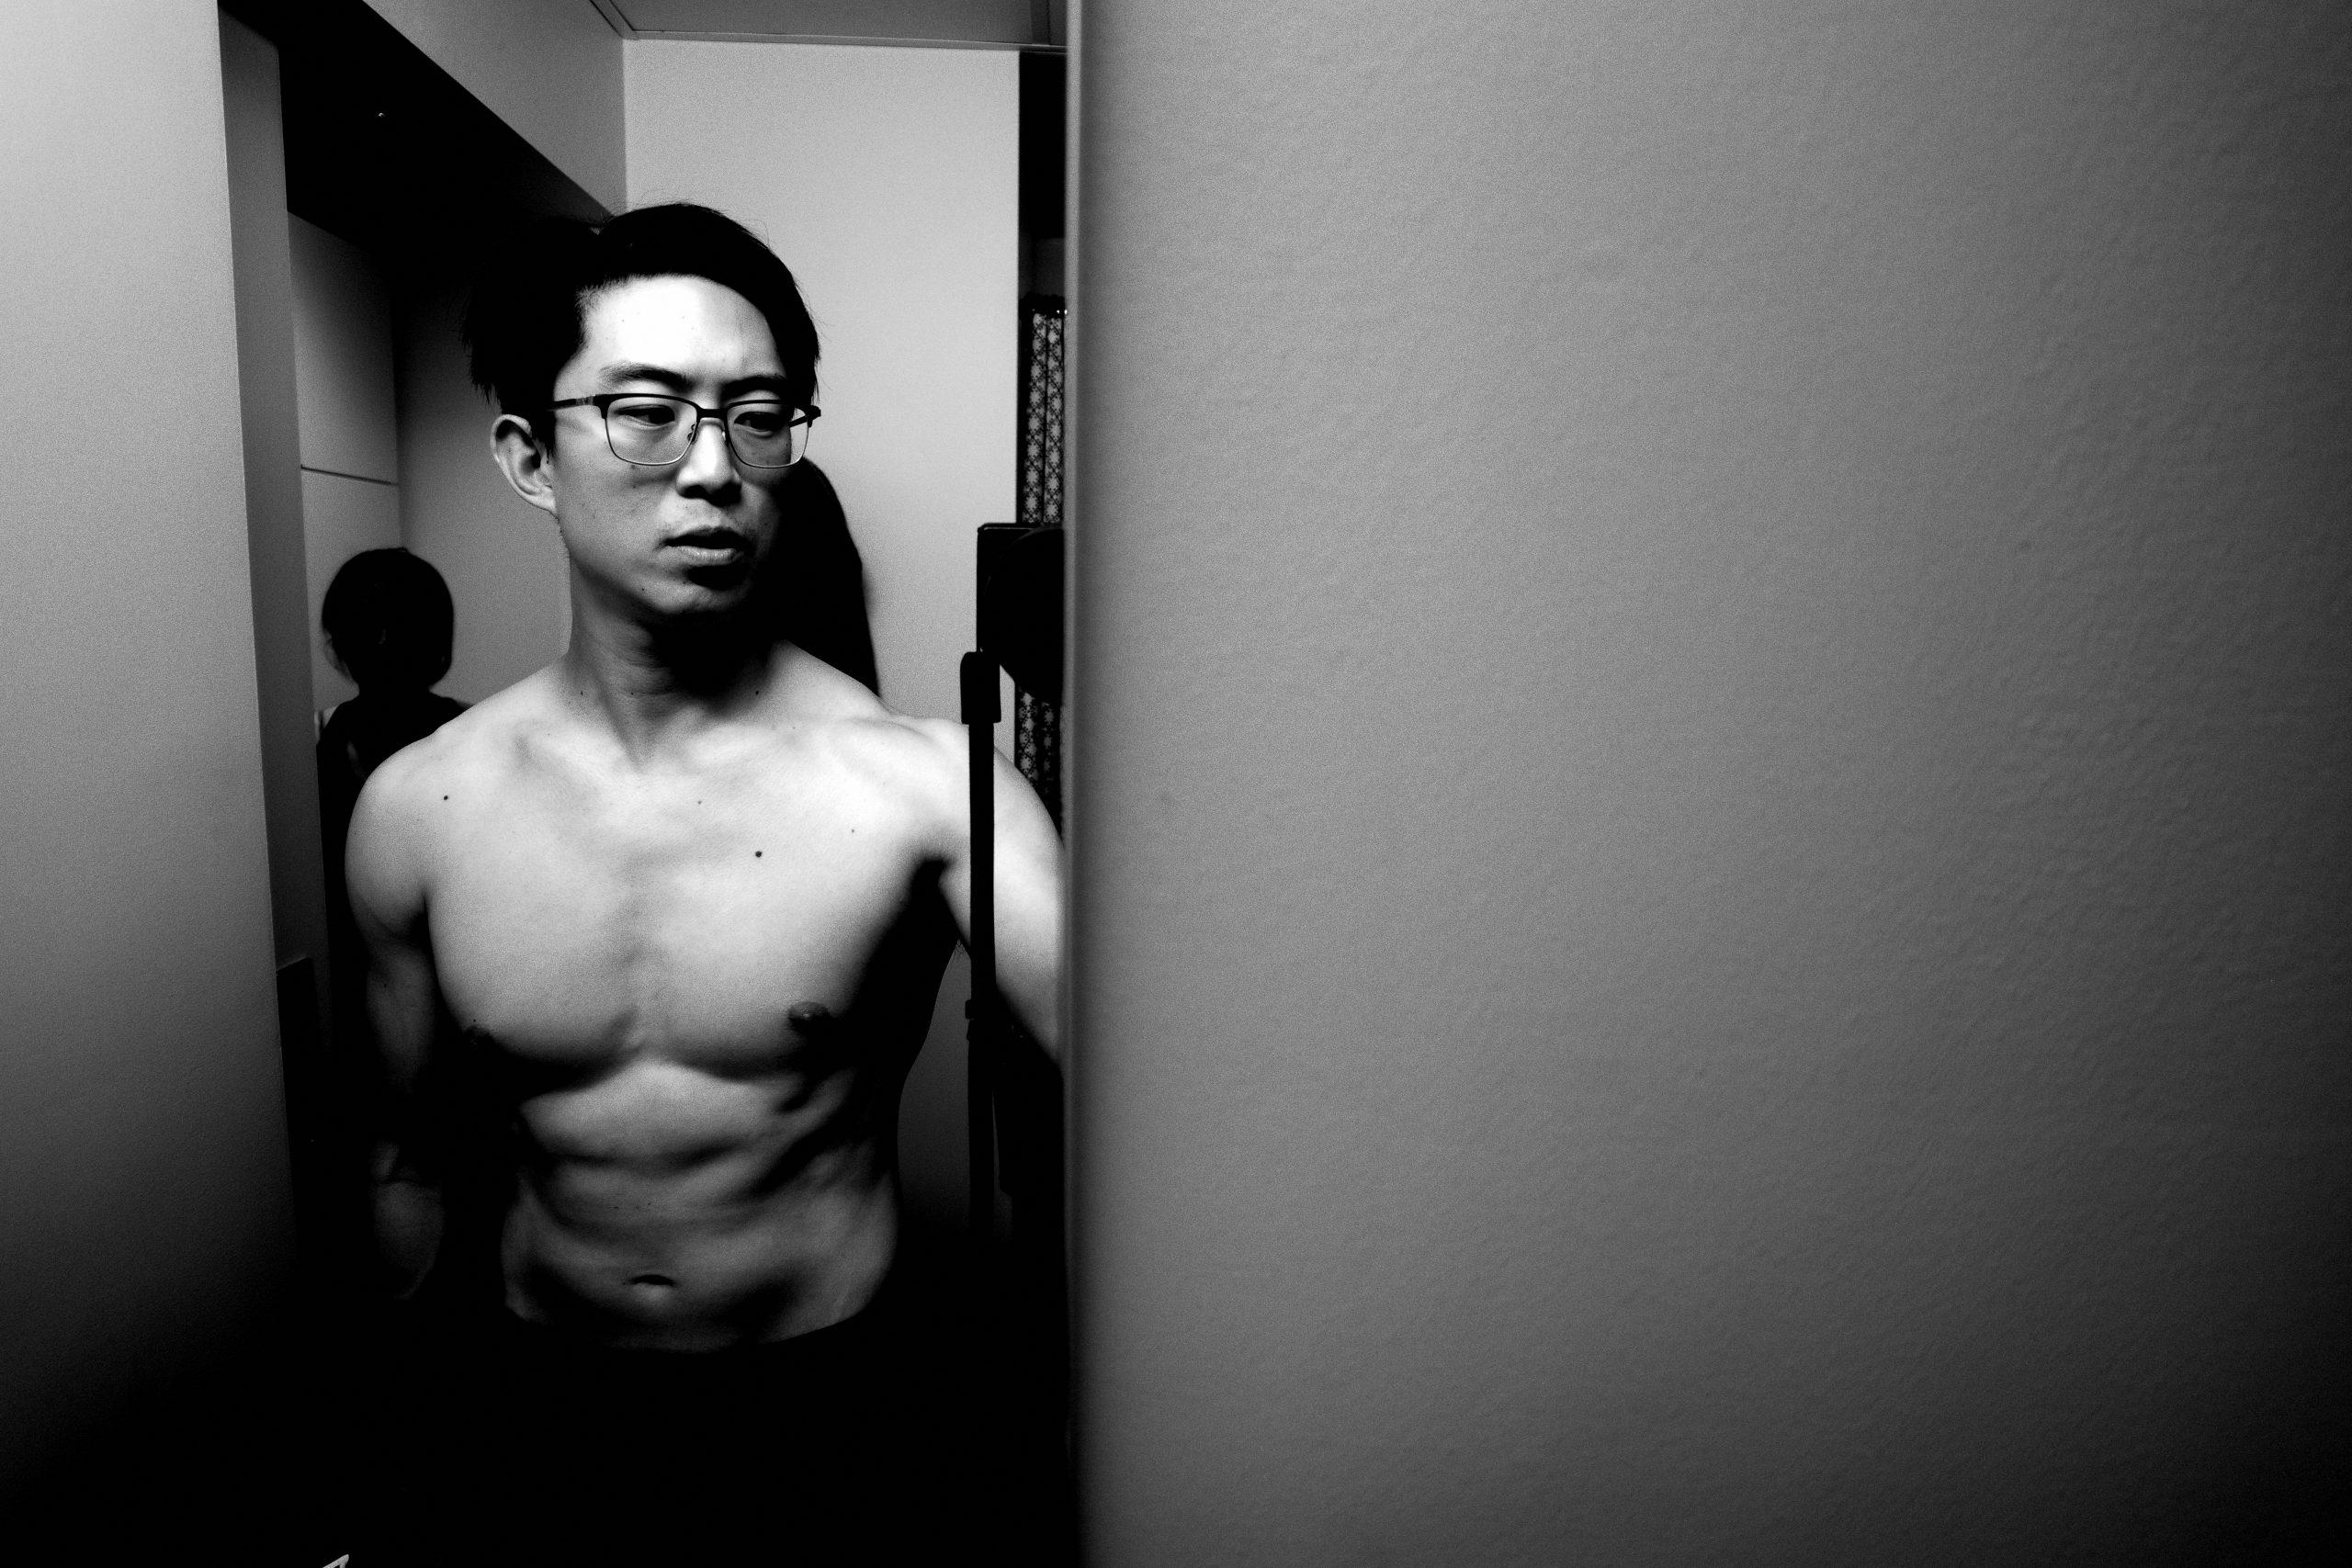 selfie Eric muscle